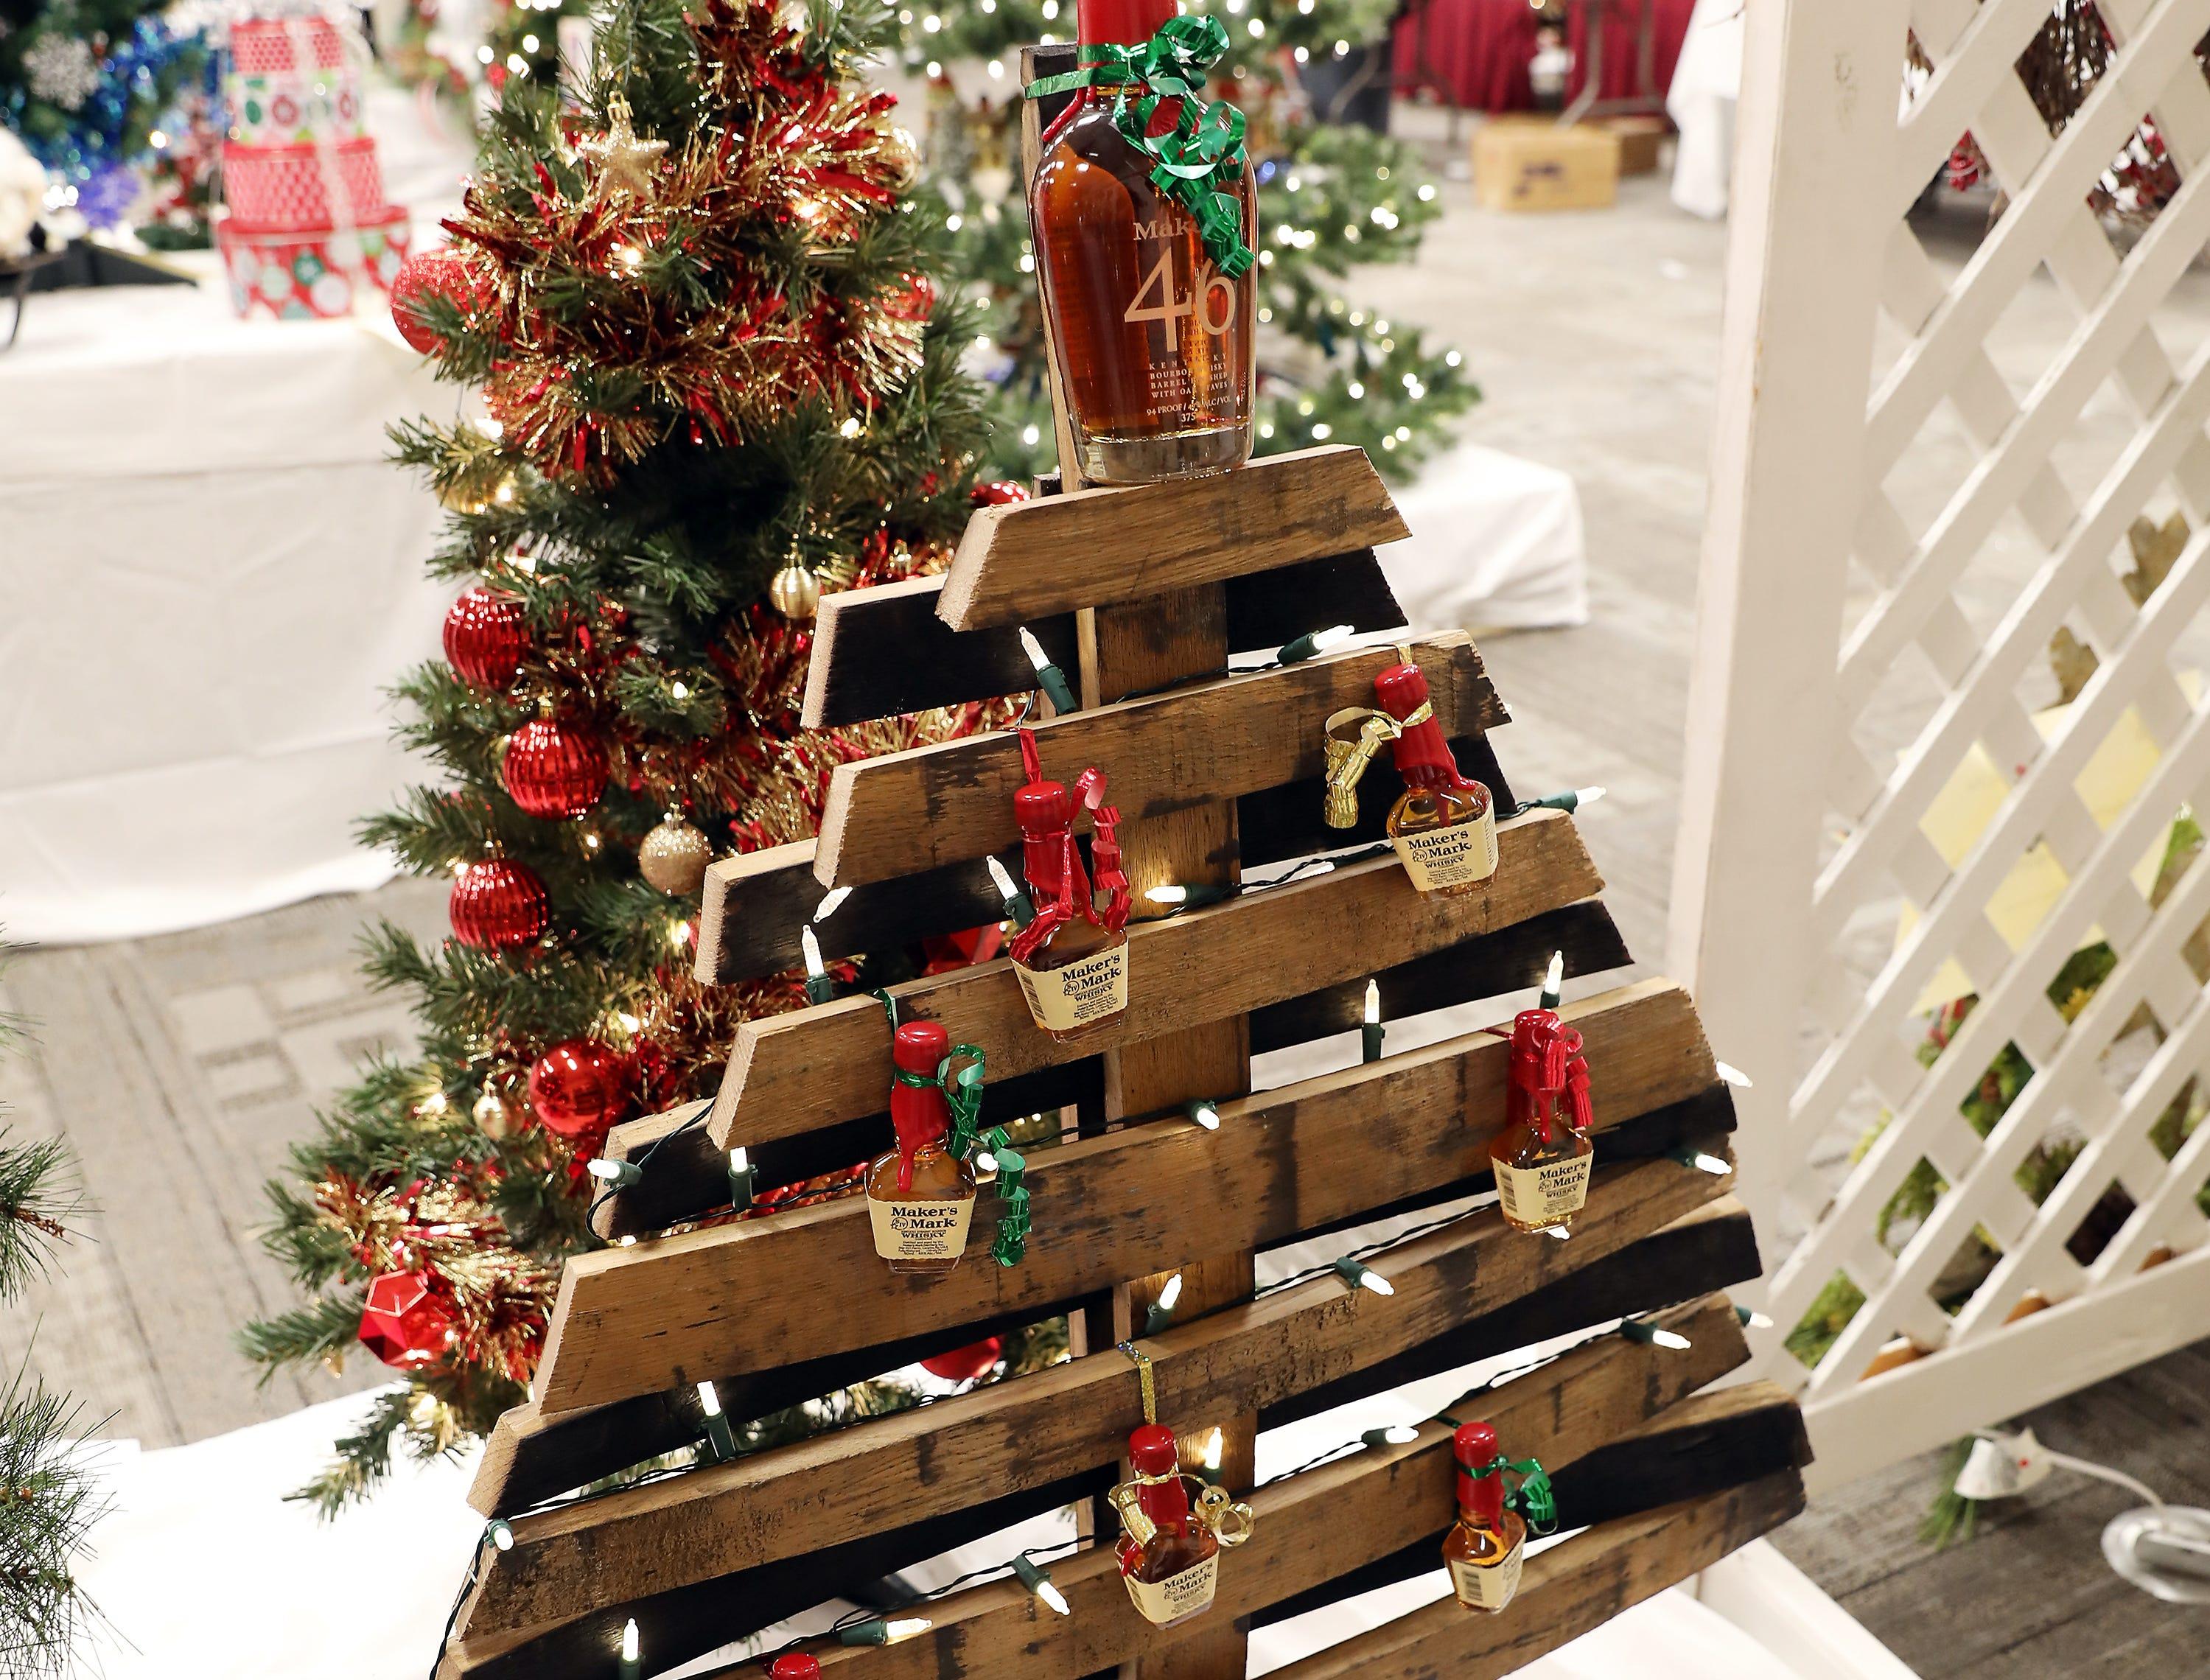 1814:00 PMOhio Stave CompanyMedium TreeBourbon Barrel TreeA Christmas tree crafted from a Bourbon barrel.Enjoy your holiday season with bottles of Bourbon whiskey!